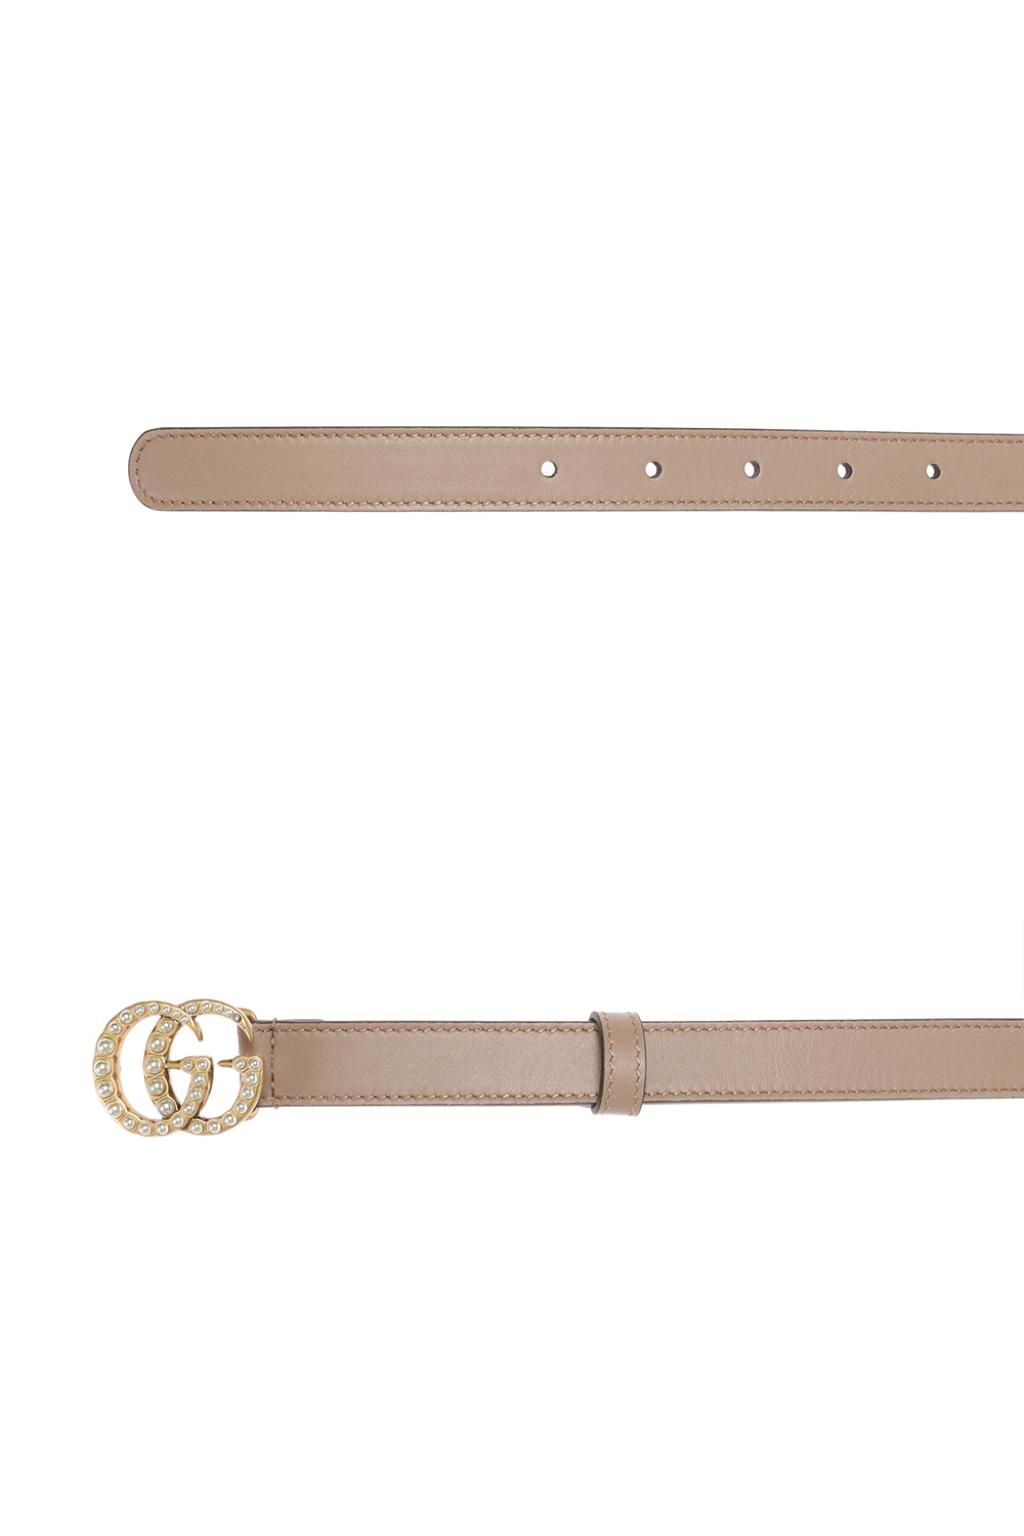 Gucci Branded thin belt